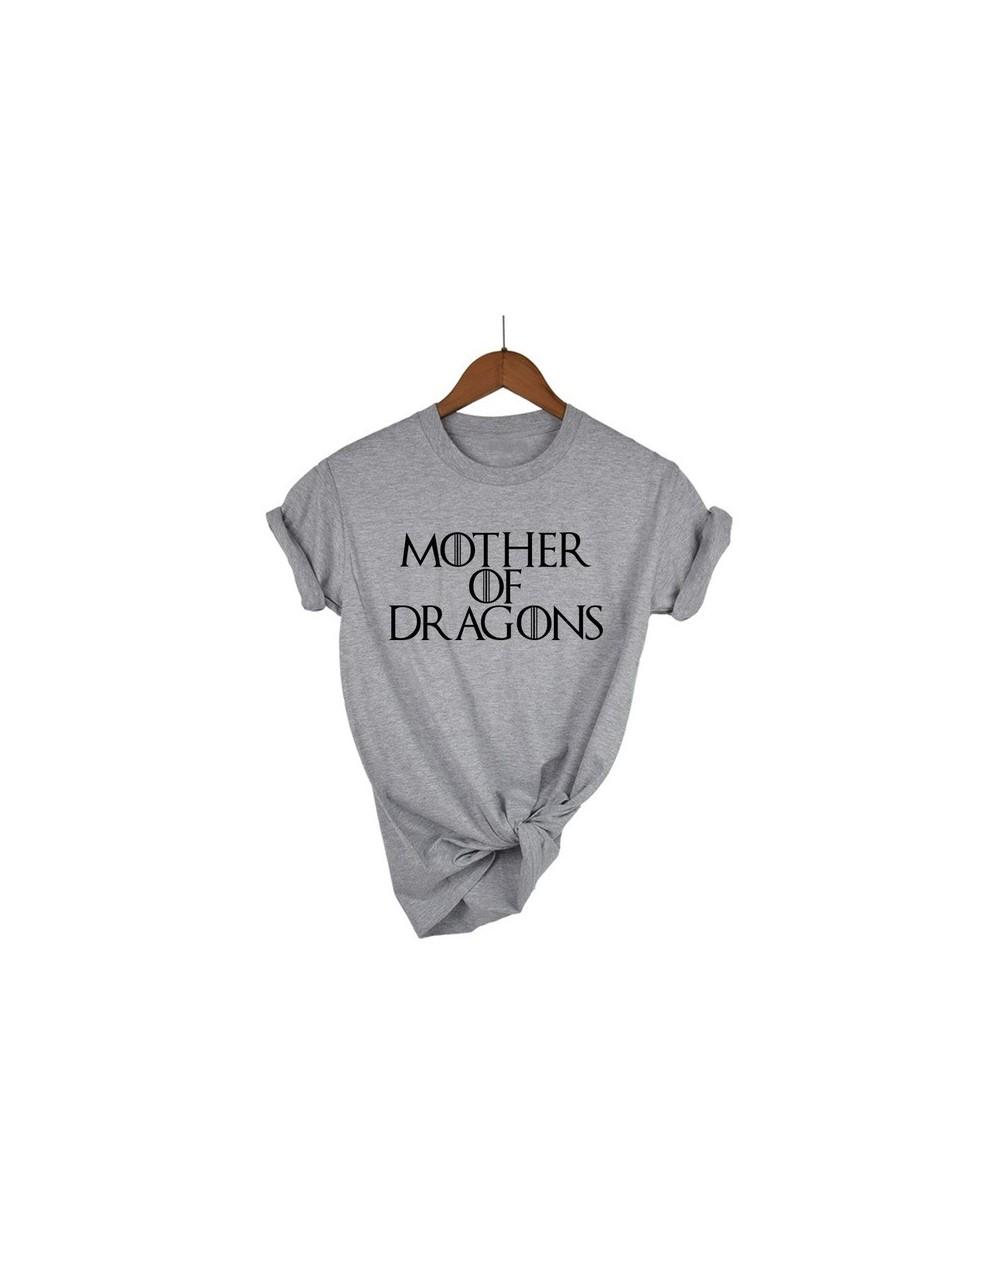 Hot 2019 T-shirt Women Game of Thrones Ringer Tee Shirt Femme Mother of Dragons T Shirt Female Short Sleeve Cool O-neck Tops...